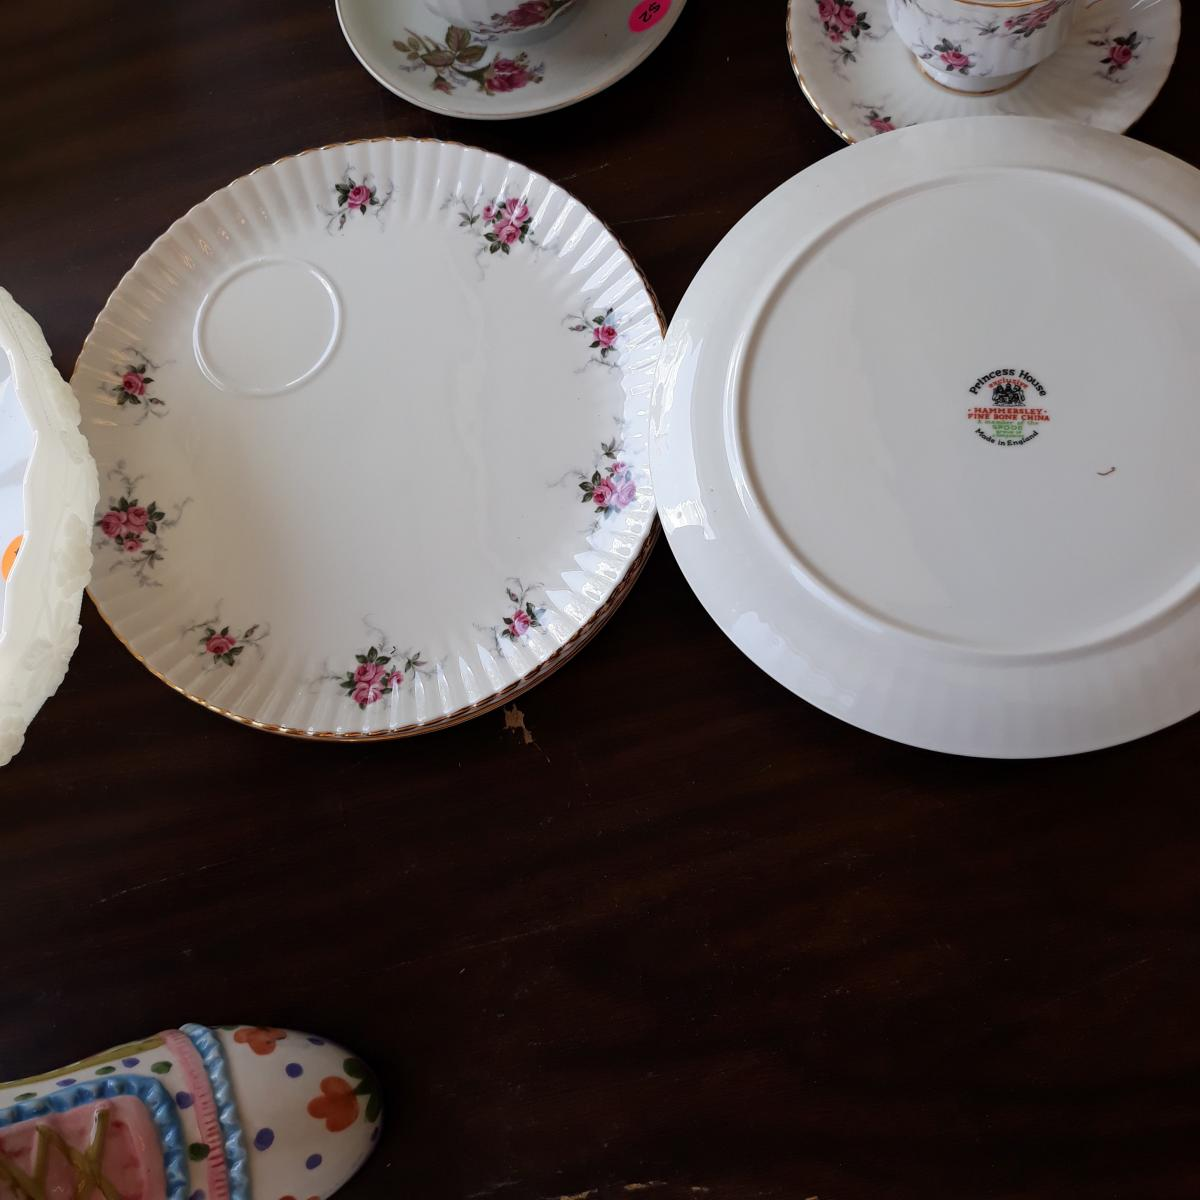 Photo 6 of Collectible china